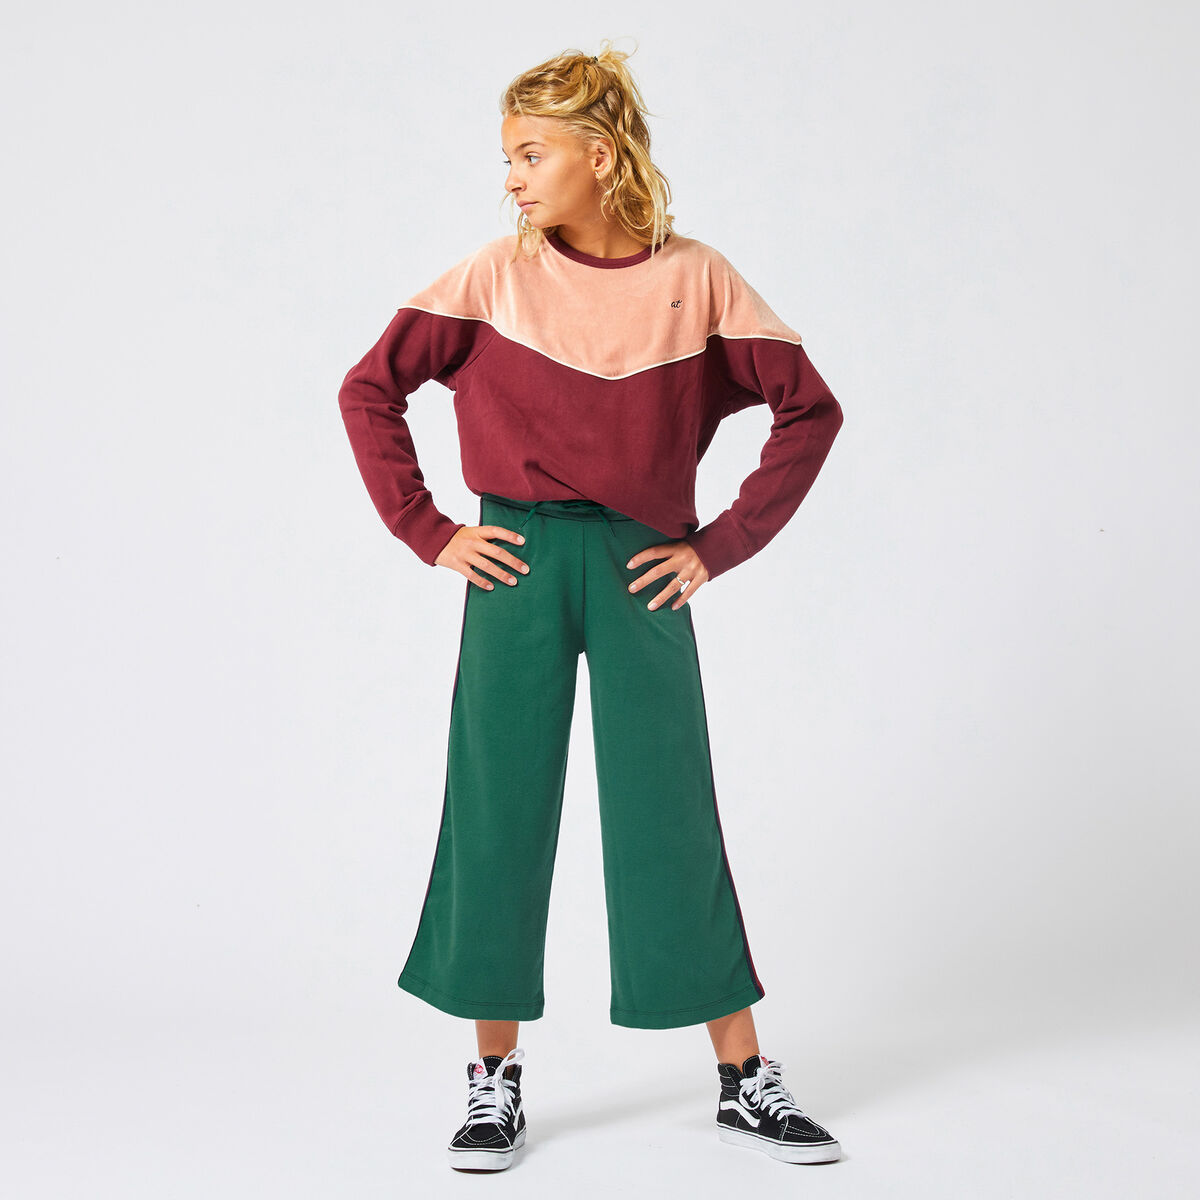 Sweater Selina Jr.